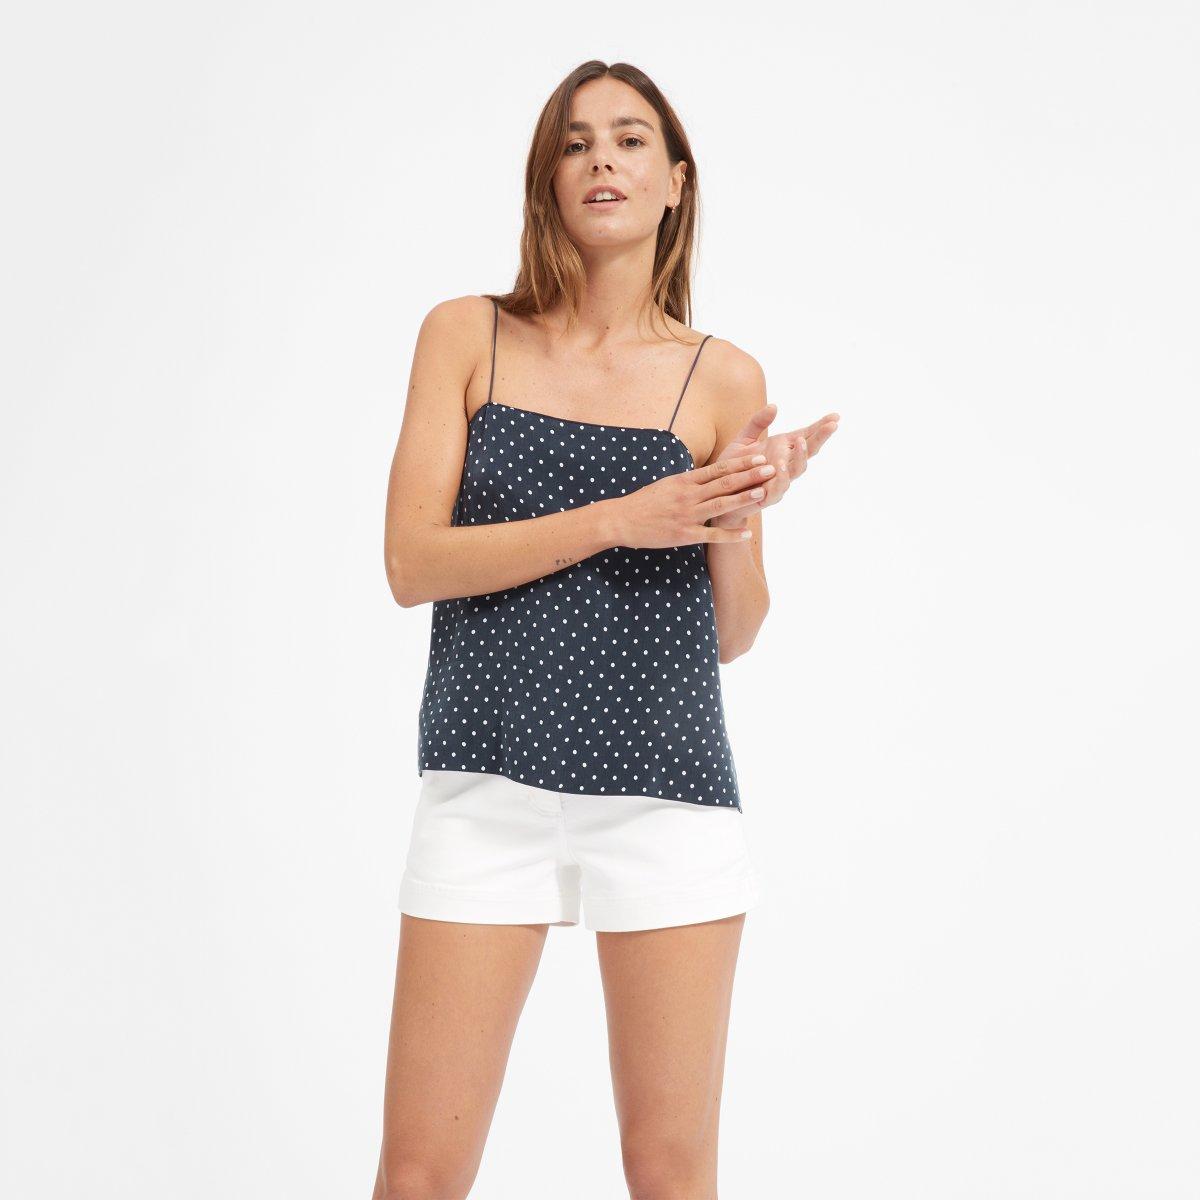 Everlane Choose What You Pay / Polka Dot Cami - Sunshine Style, A Florida Based Fashion Blog